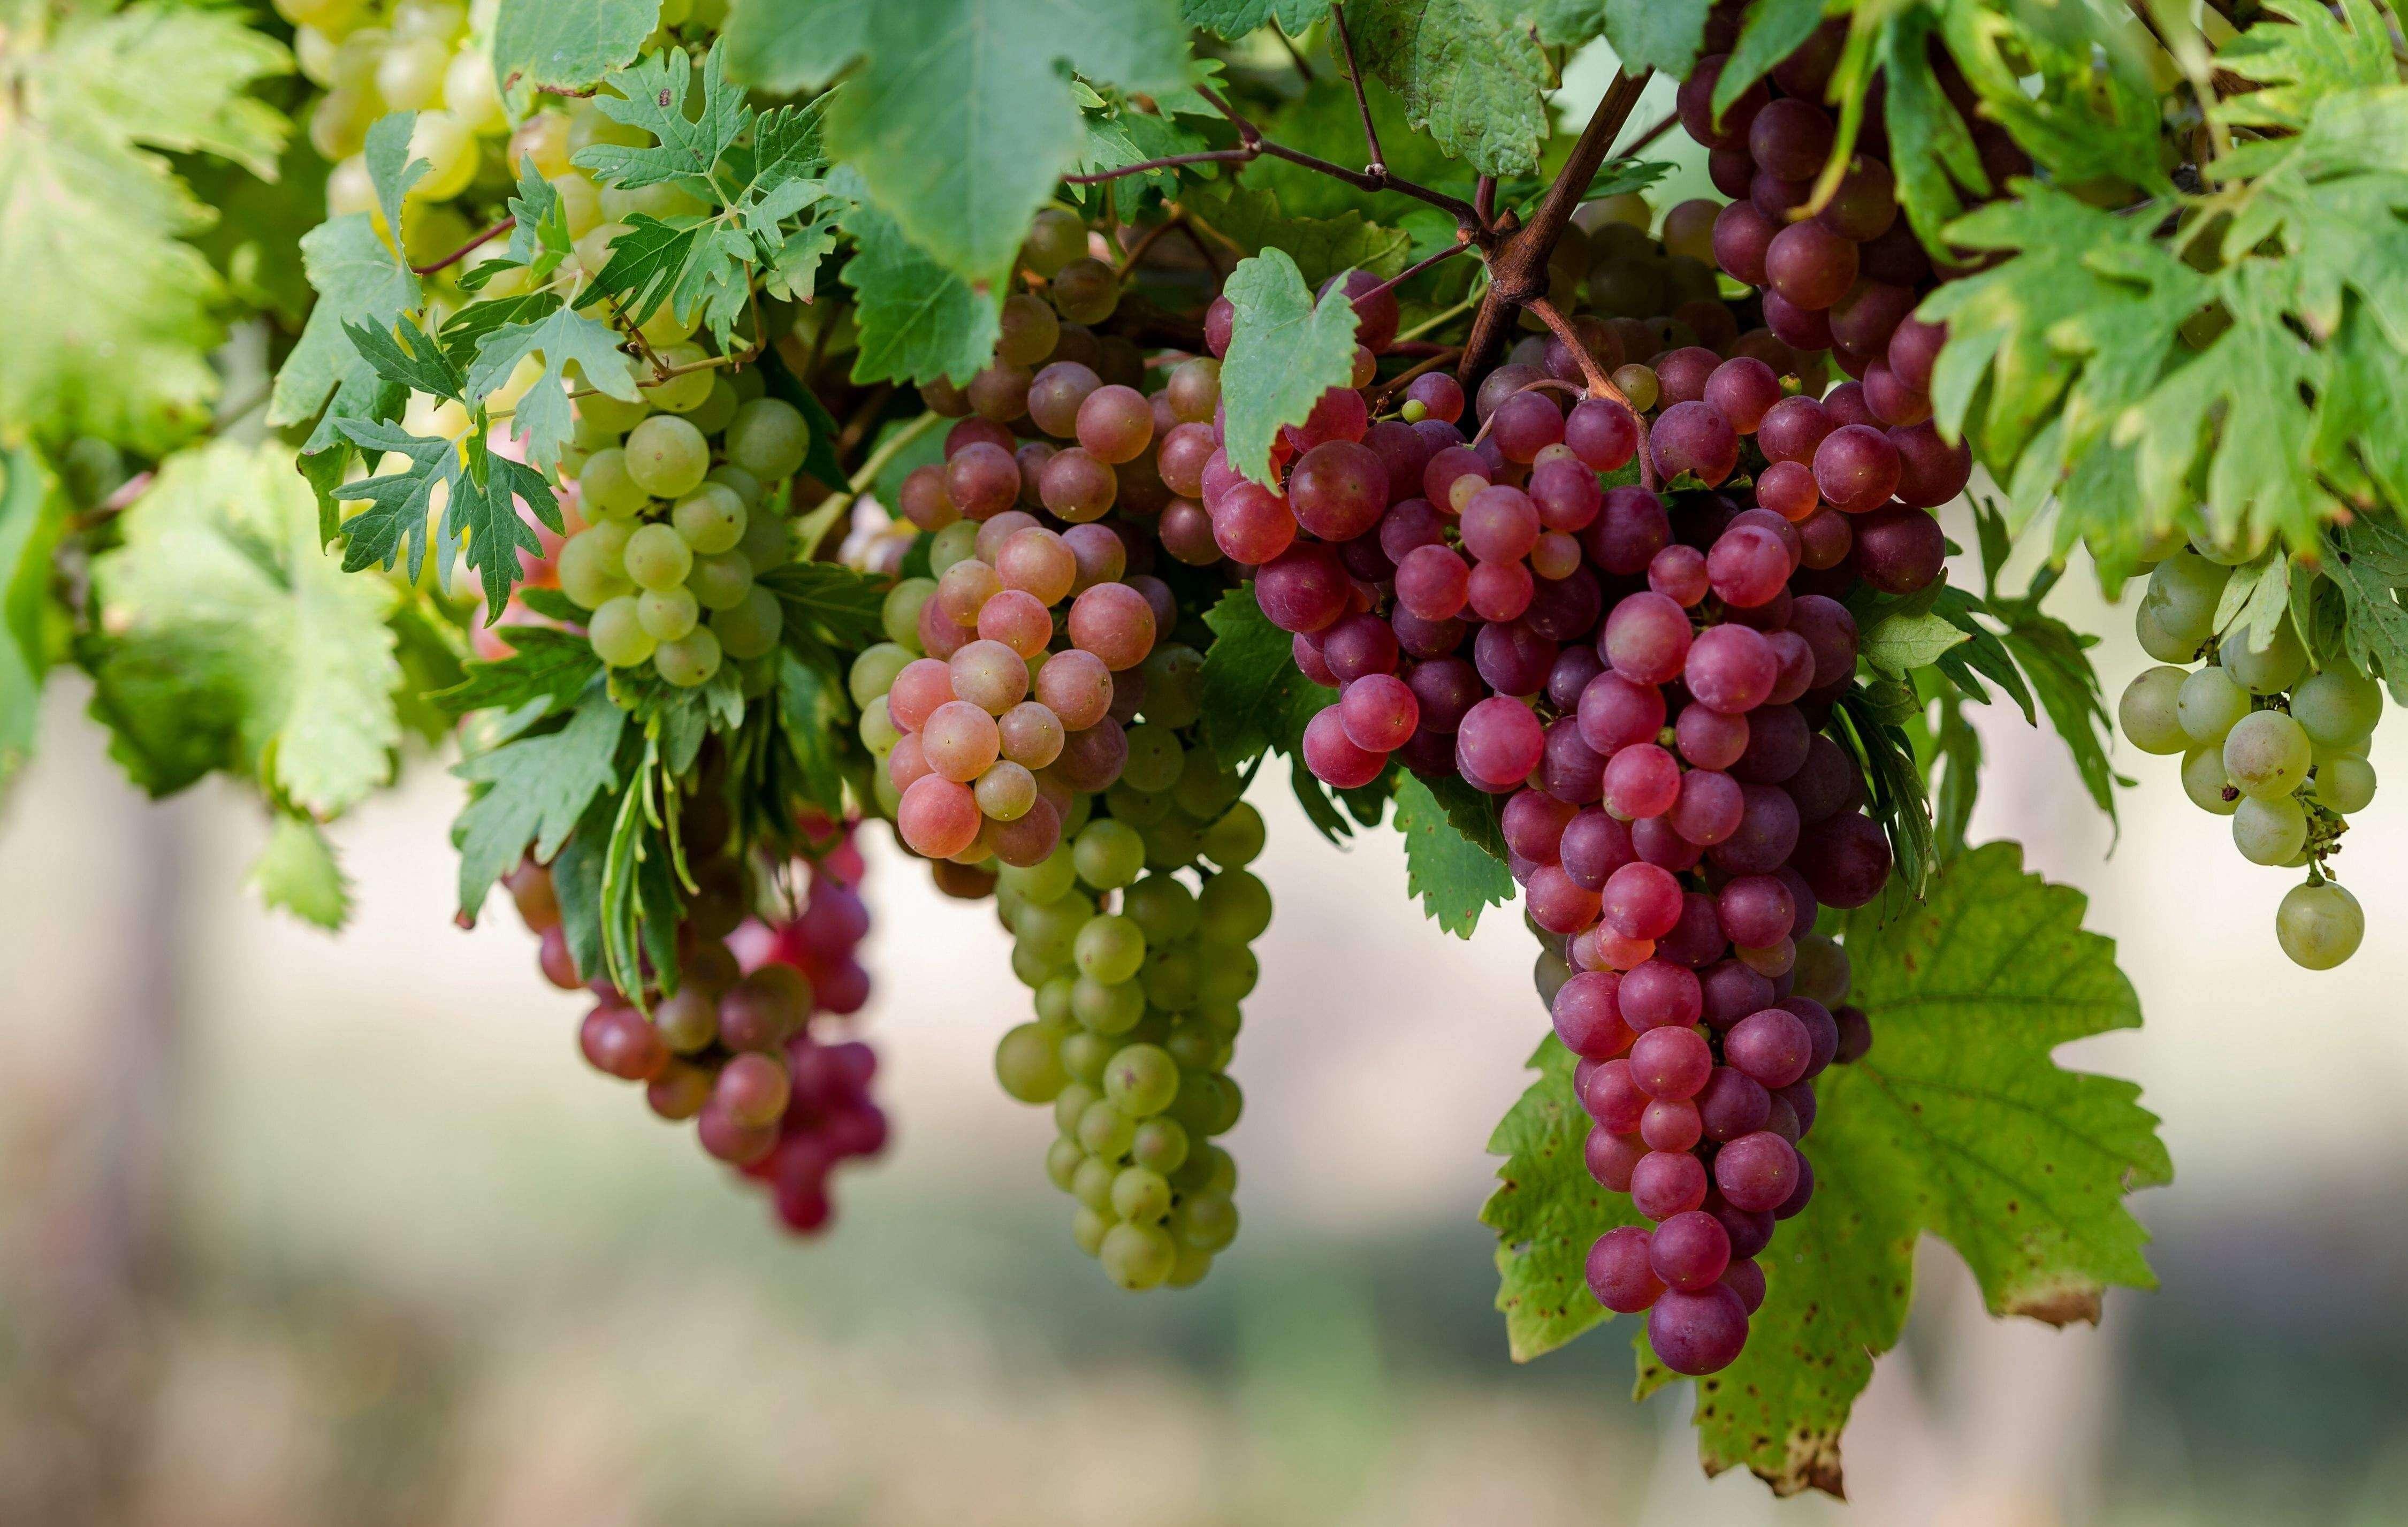 Агротехника винограда - основные характеристики